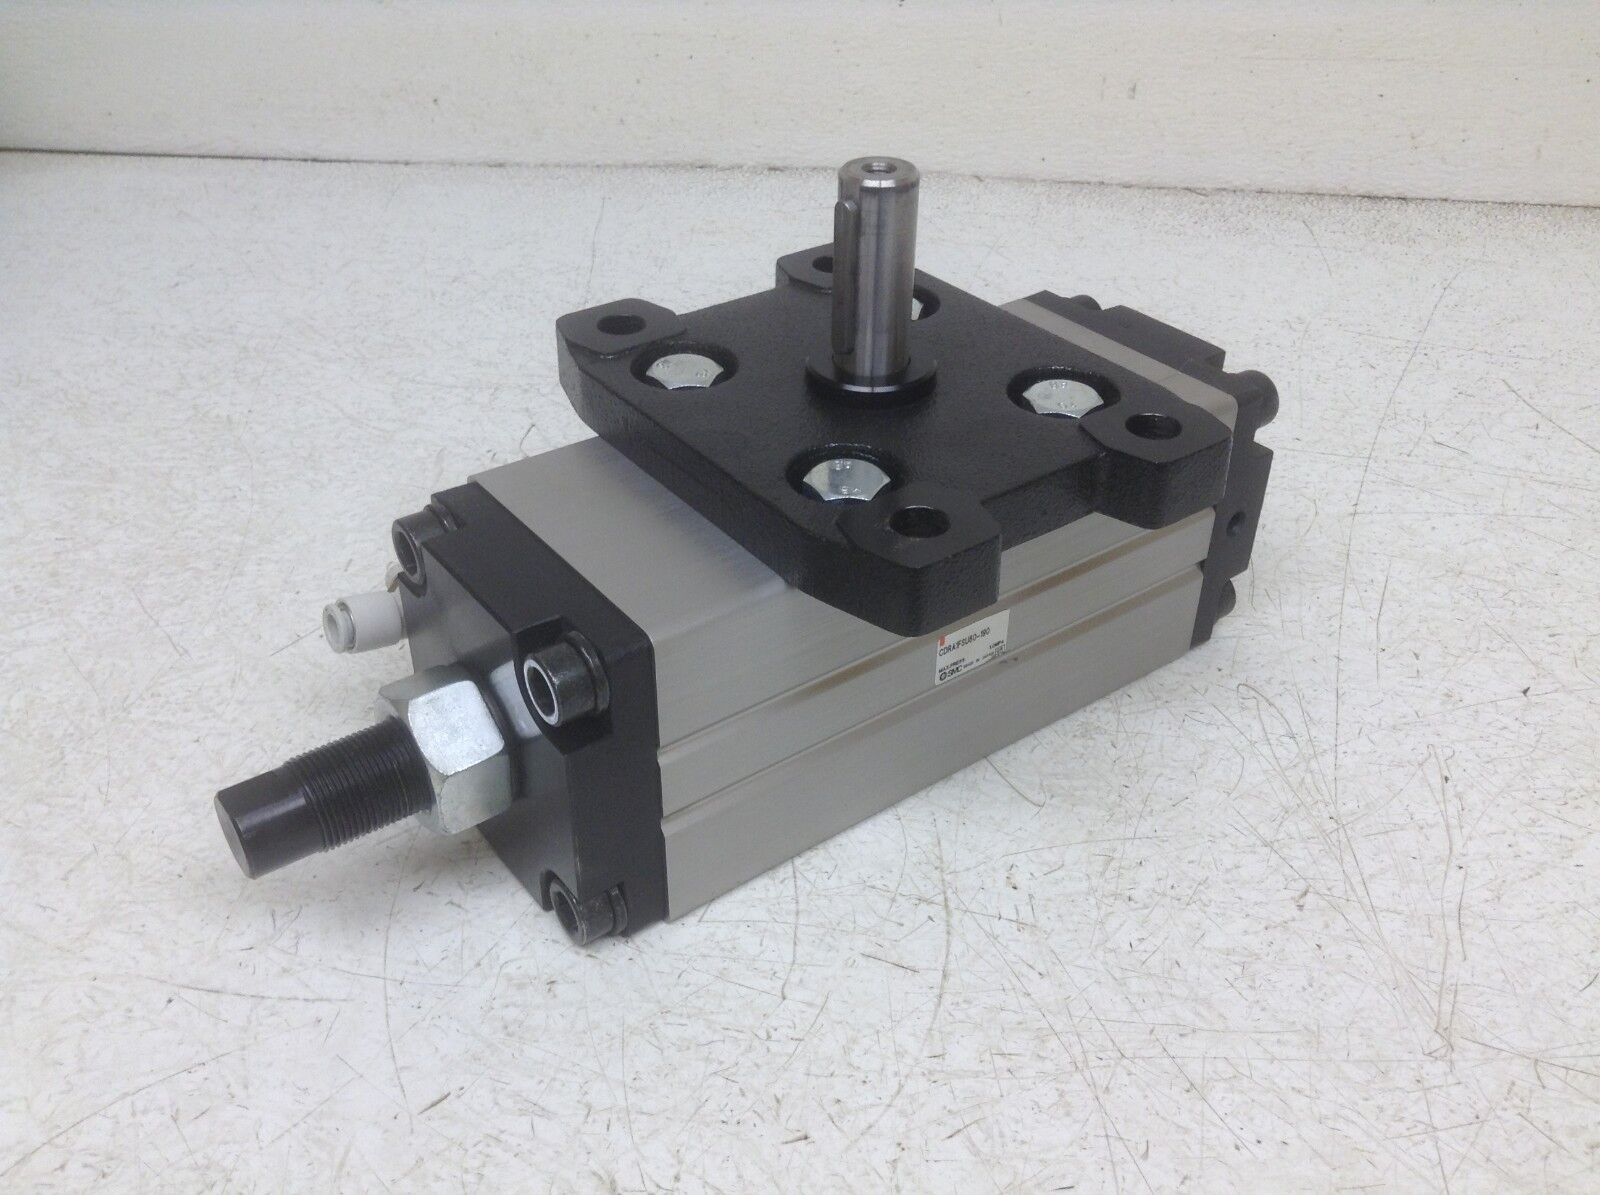 SMC Cdra1fsu80-190 Pneumatic Rotary Actuator CDRA1FSU80190